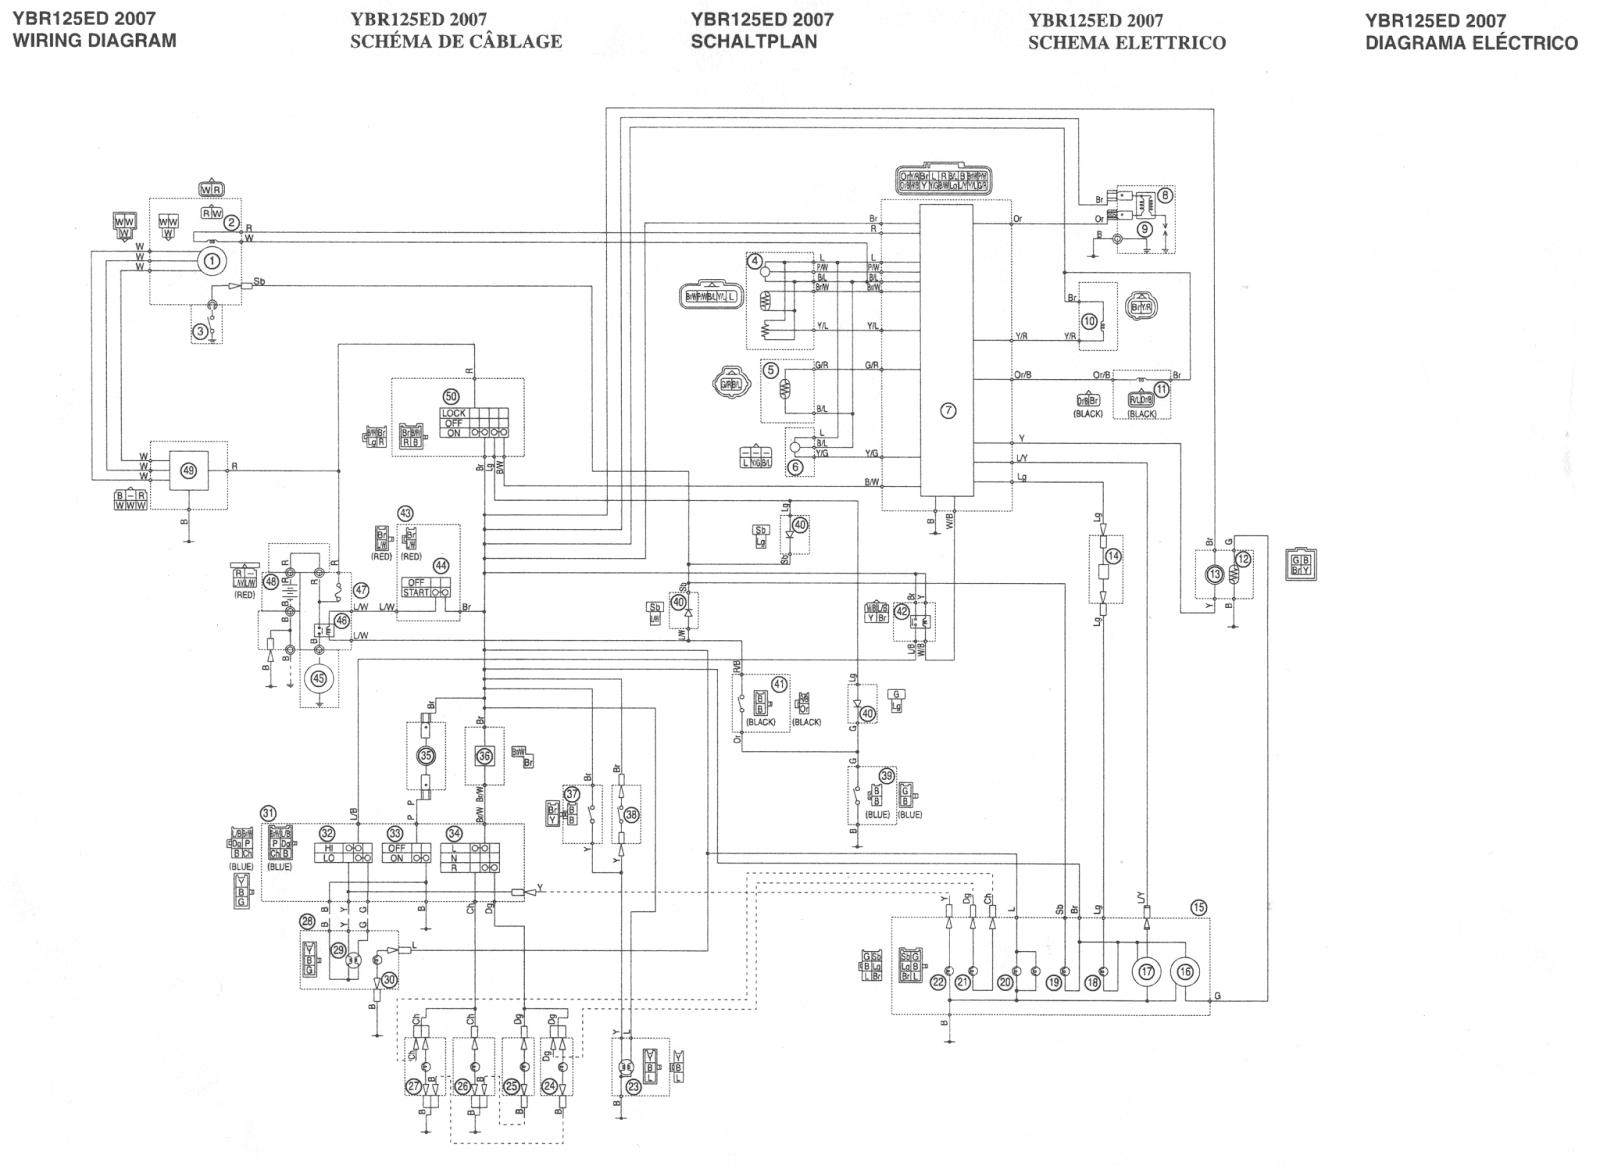 schema yamaha ybr 125 owner blog yamaha ybr 125 electrical system yamaha virago 250 wiring diagram [ 1600 x 1166 Pixel ]